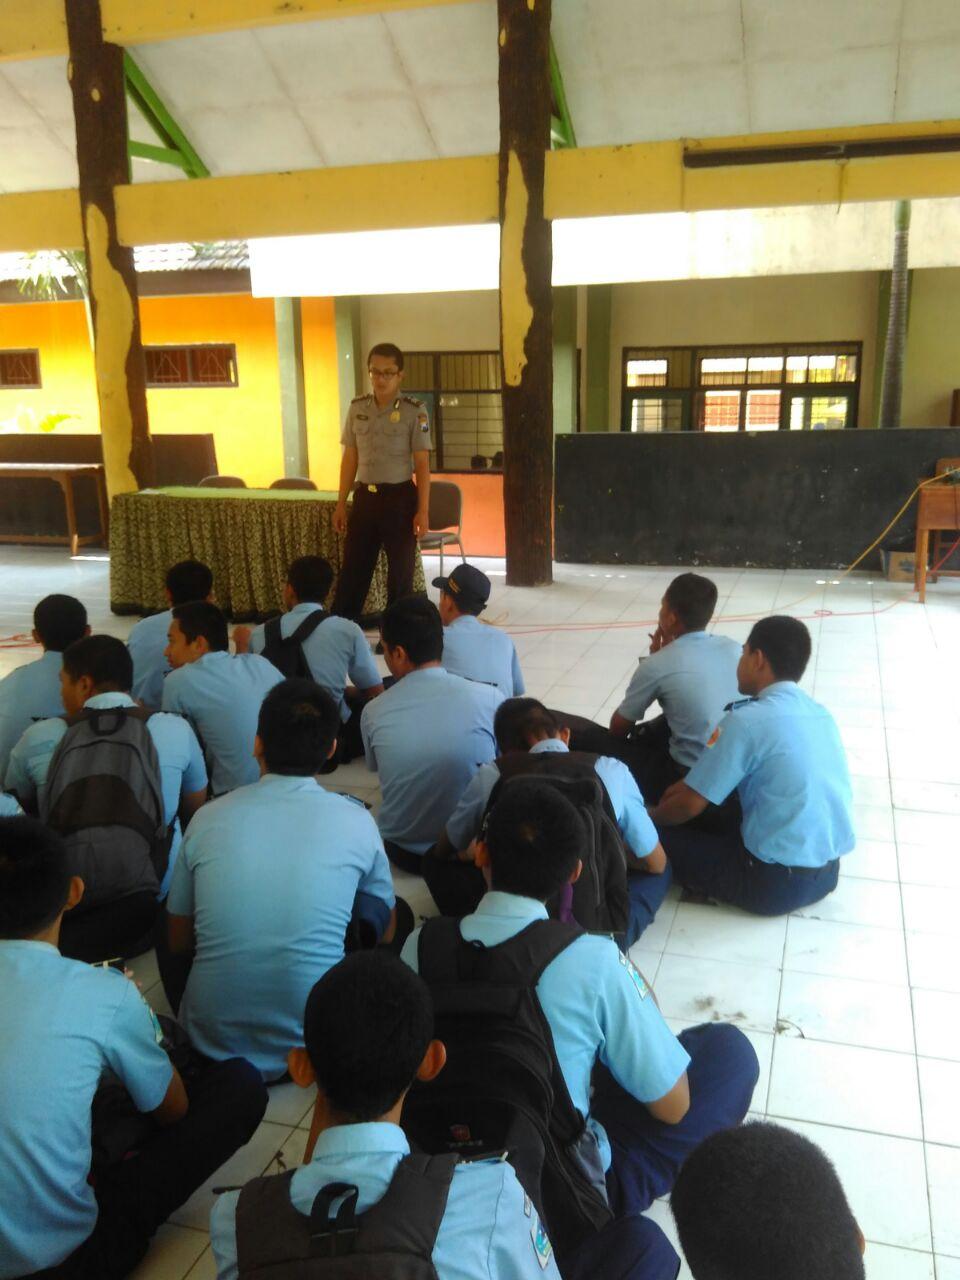 Bhabinkamtibmas Desa Pagersari Polsek Ngantang Polres Batu Melaksanakan giat Binluh Kenakalan remaja di SMP Satap dan dilanjutkan DDS